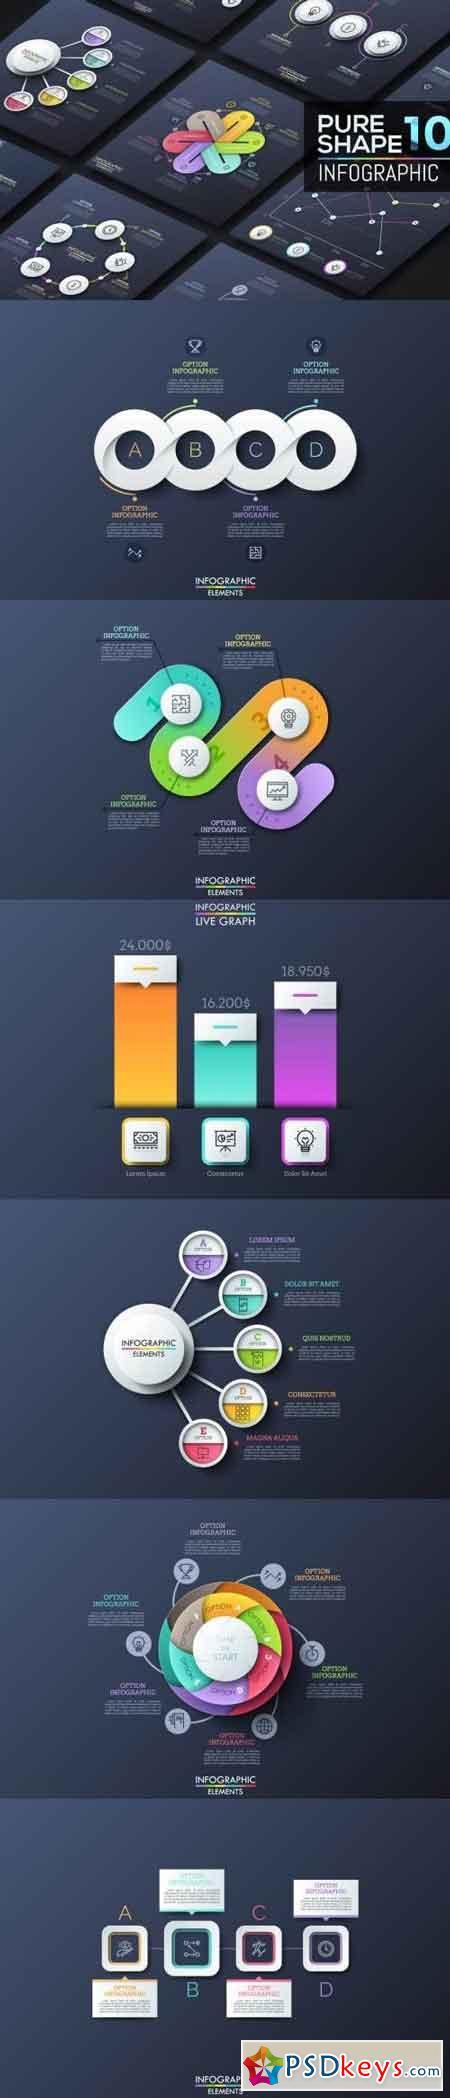 Pure Shape Infographic. Part 10